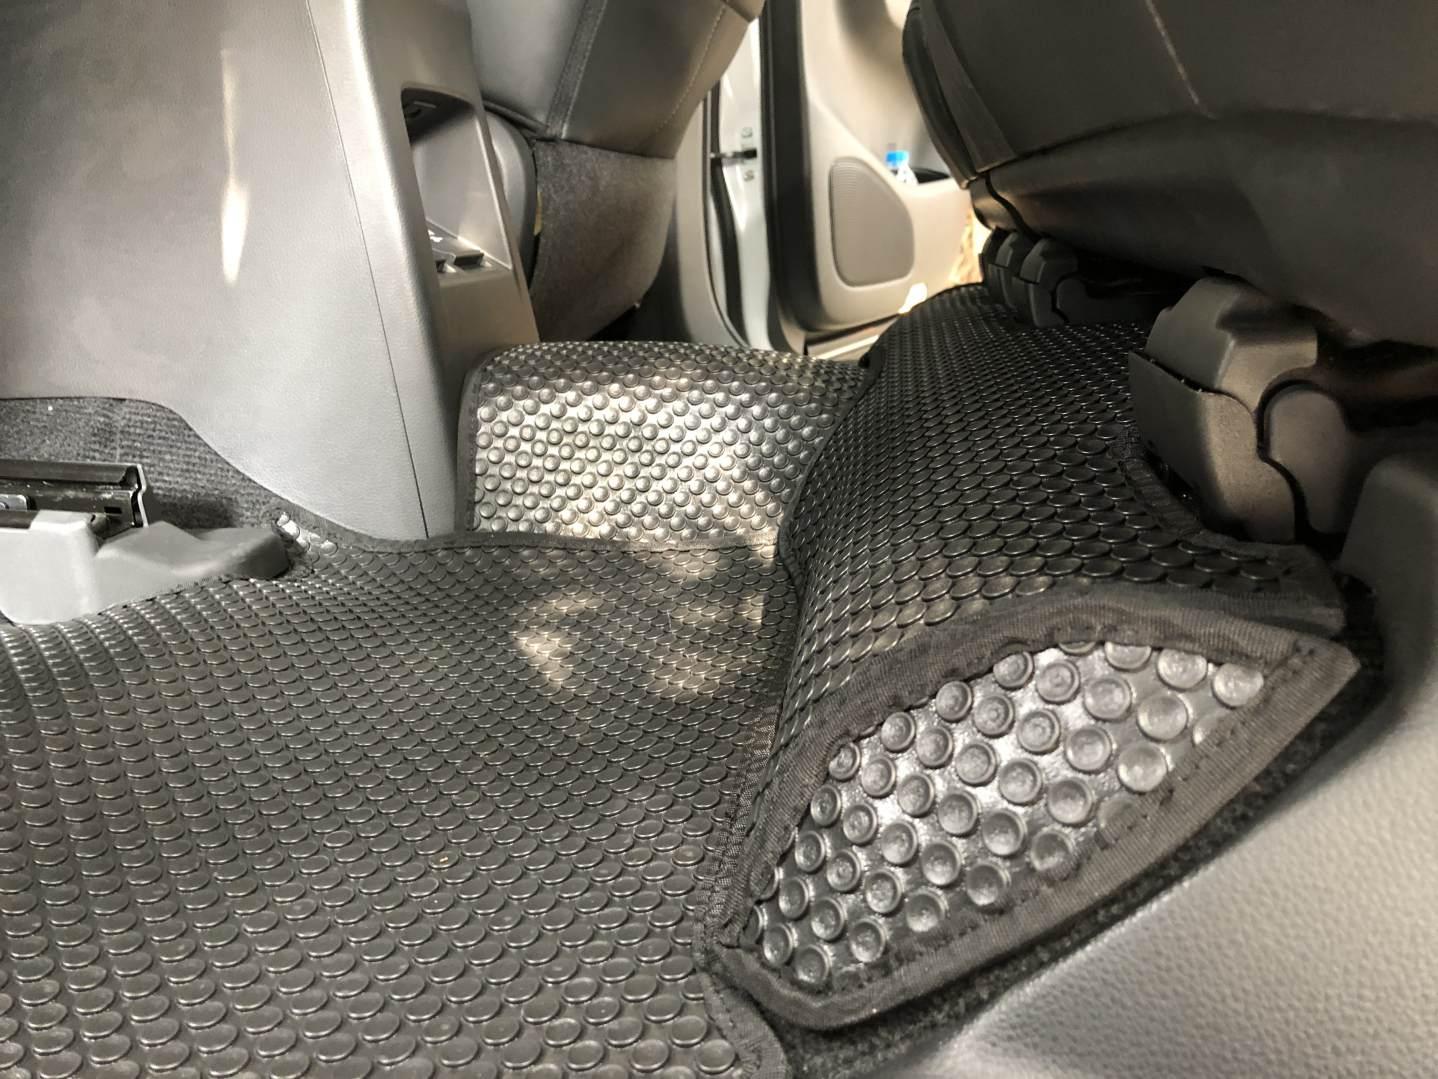 Thảm lót sàn Mitsubishi Pajero Sport 2021